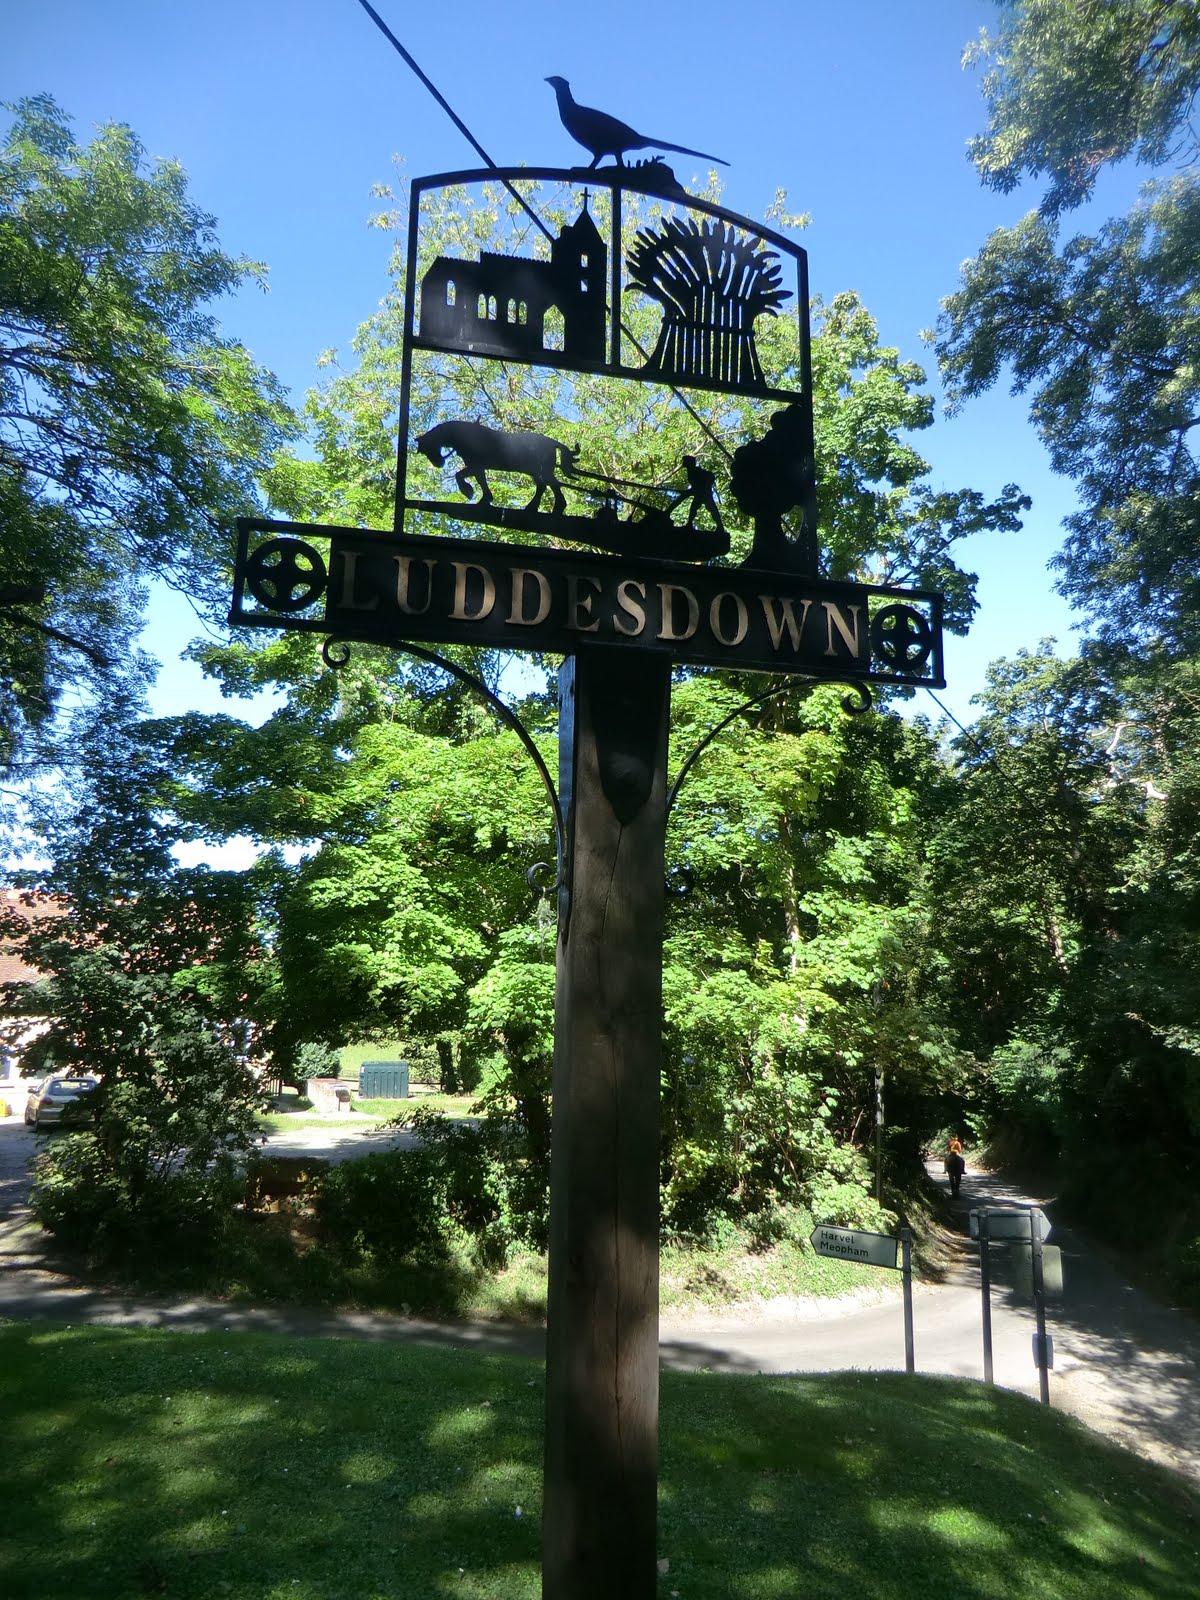 CIMG3894 Luddesdown village sign